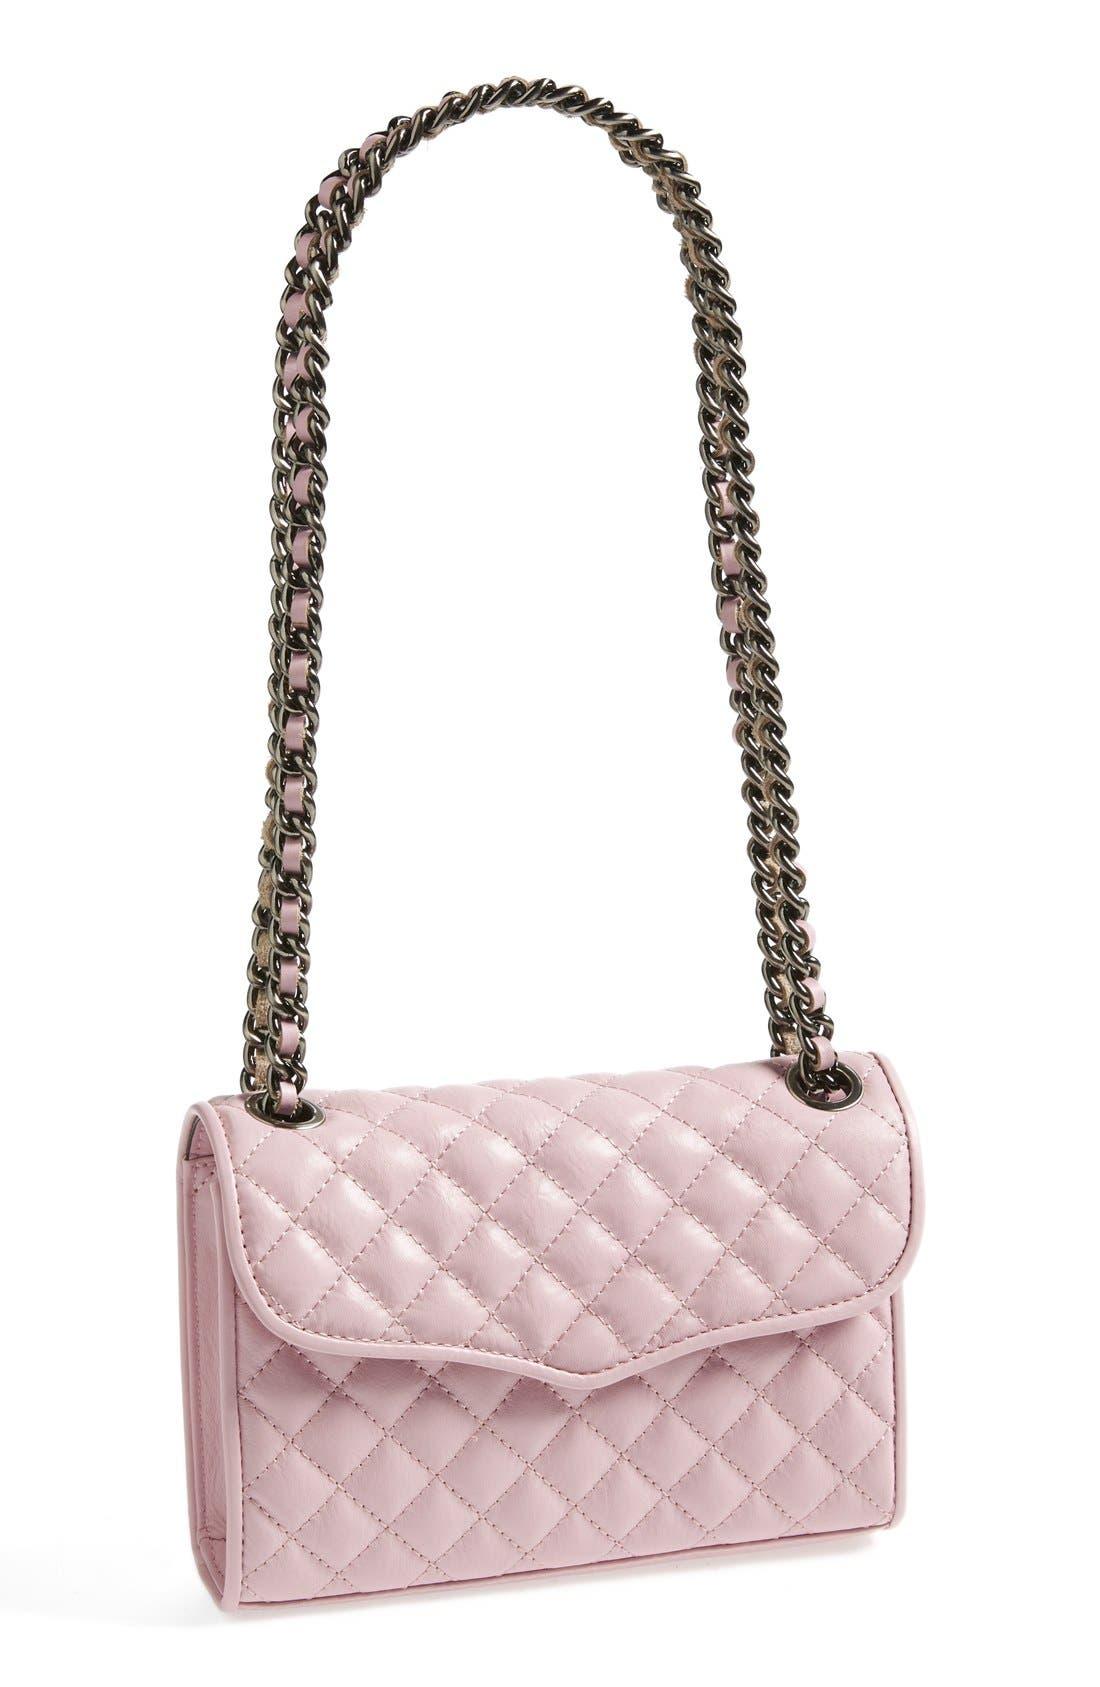 Alternate Image 1 Selected - Rebecca Minkoff 'Mini Quilted Affair' Shoulder Bag